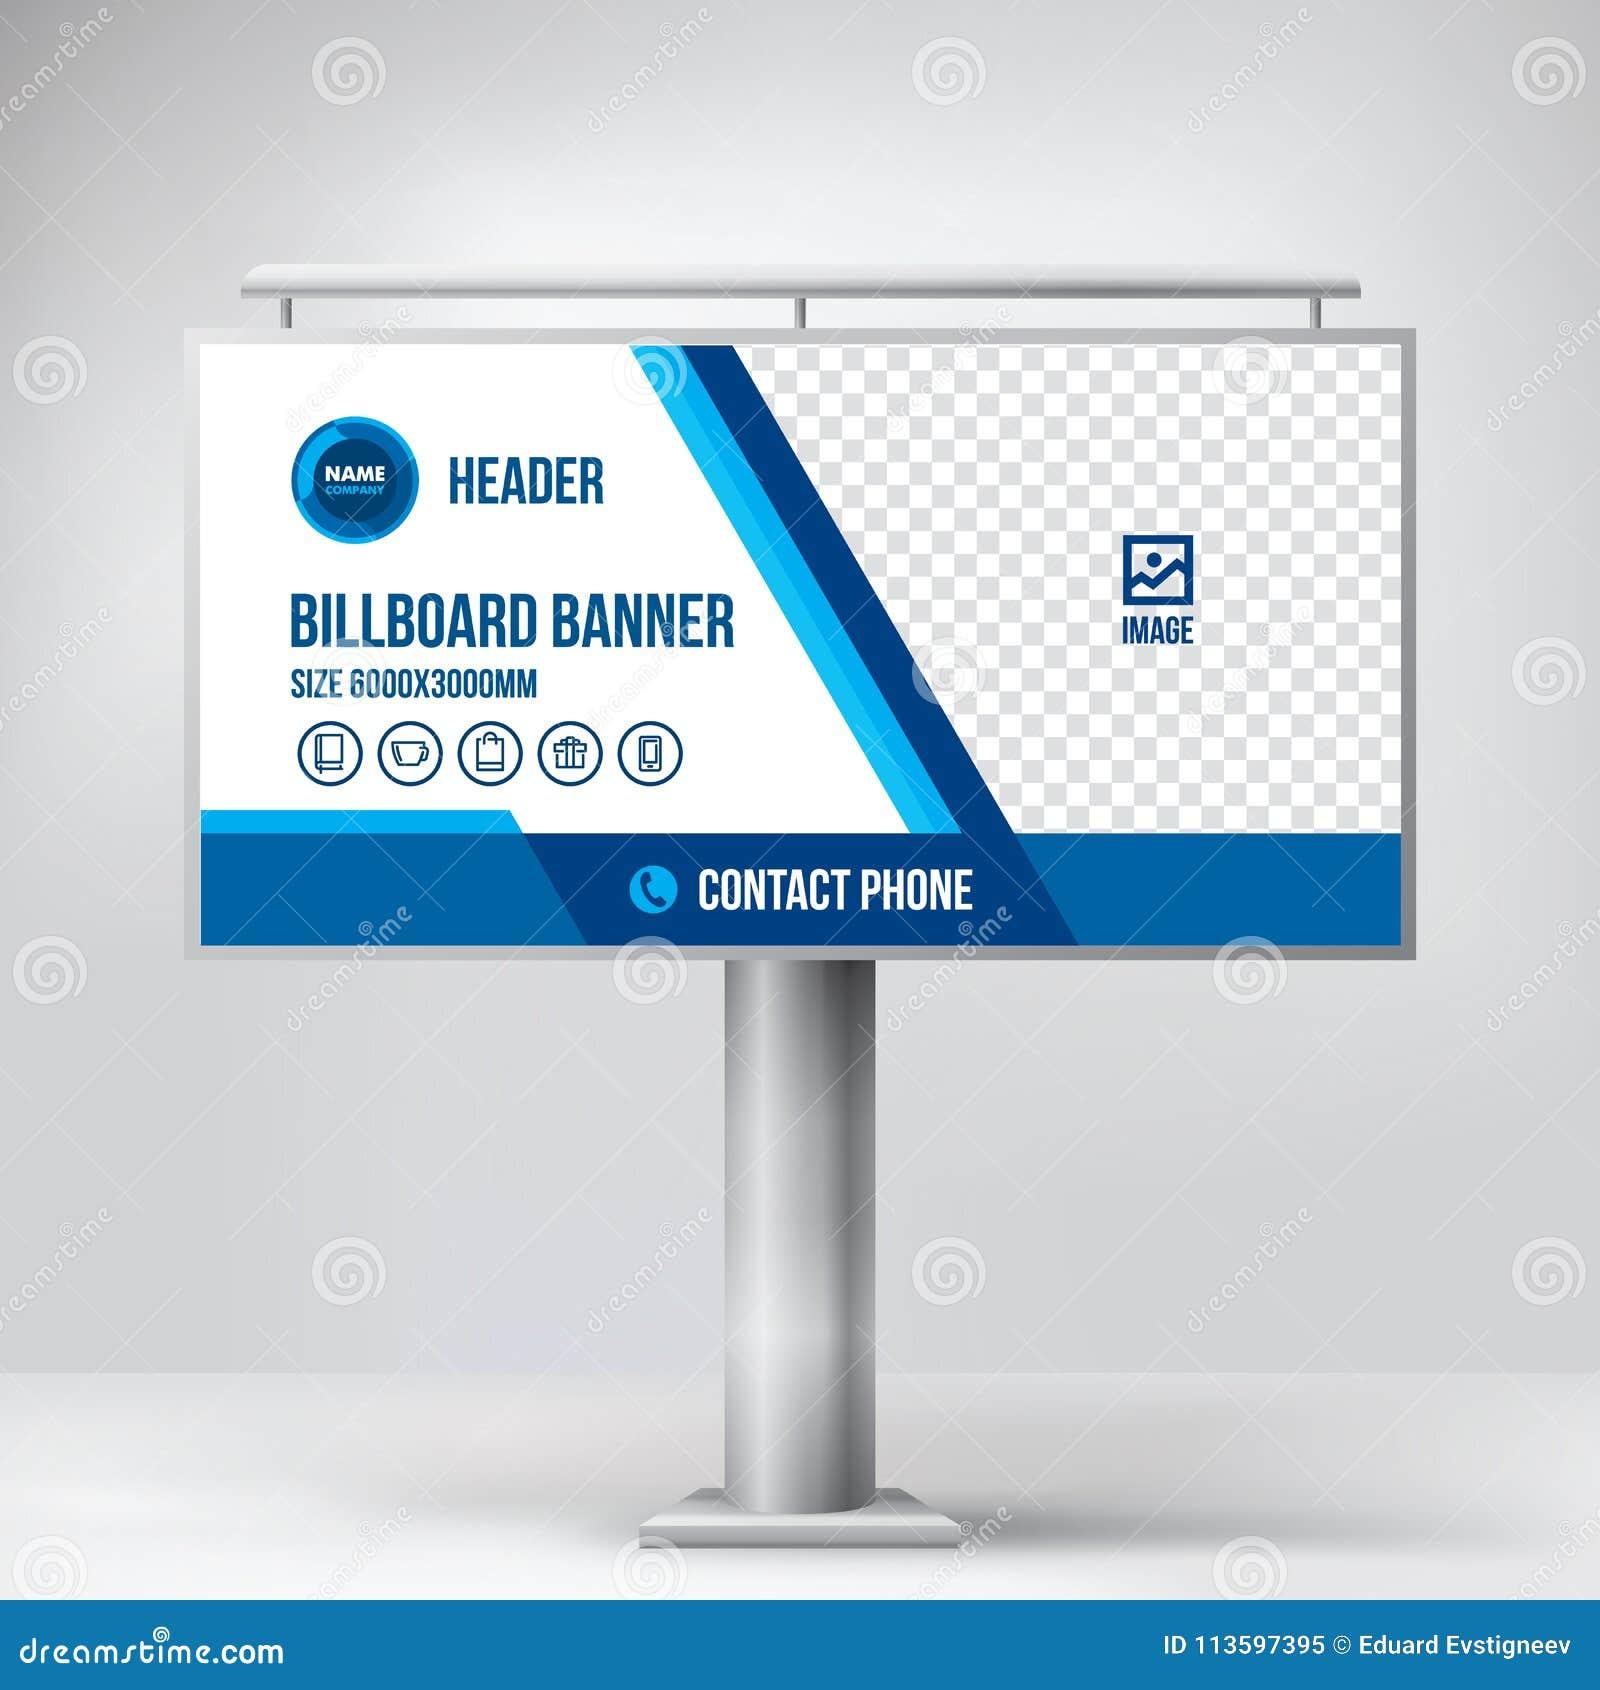 Billboard Design Template Banner For Outdoor Advertising Posting